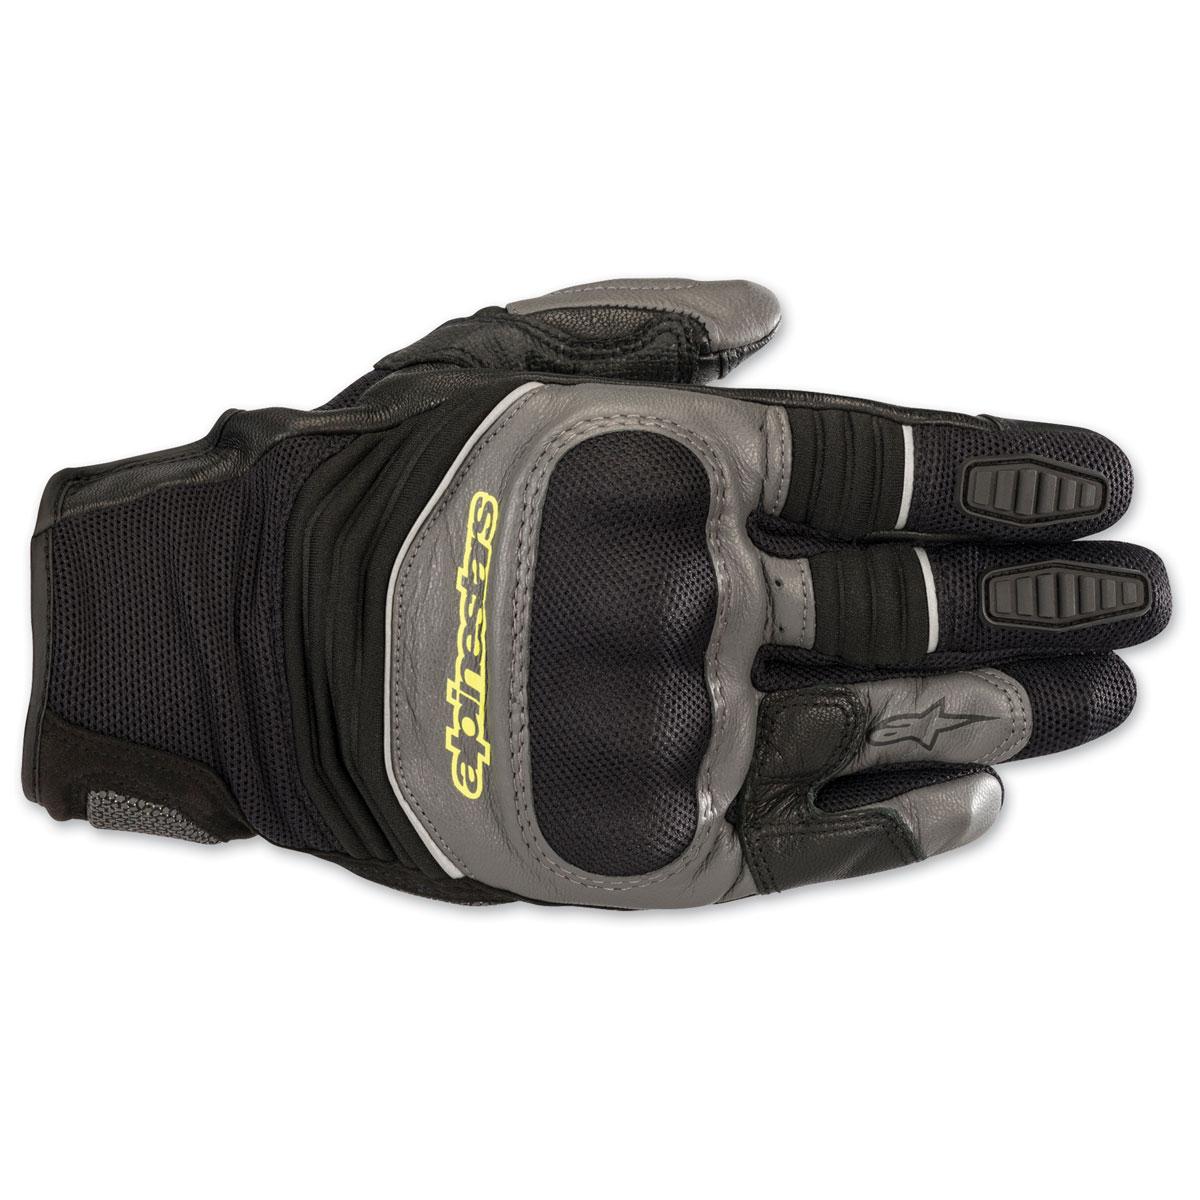 Alpinestars Men's Crosser Air Black/Gray/Yellow Gloves